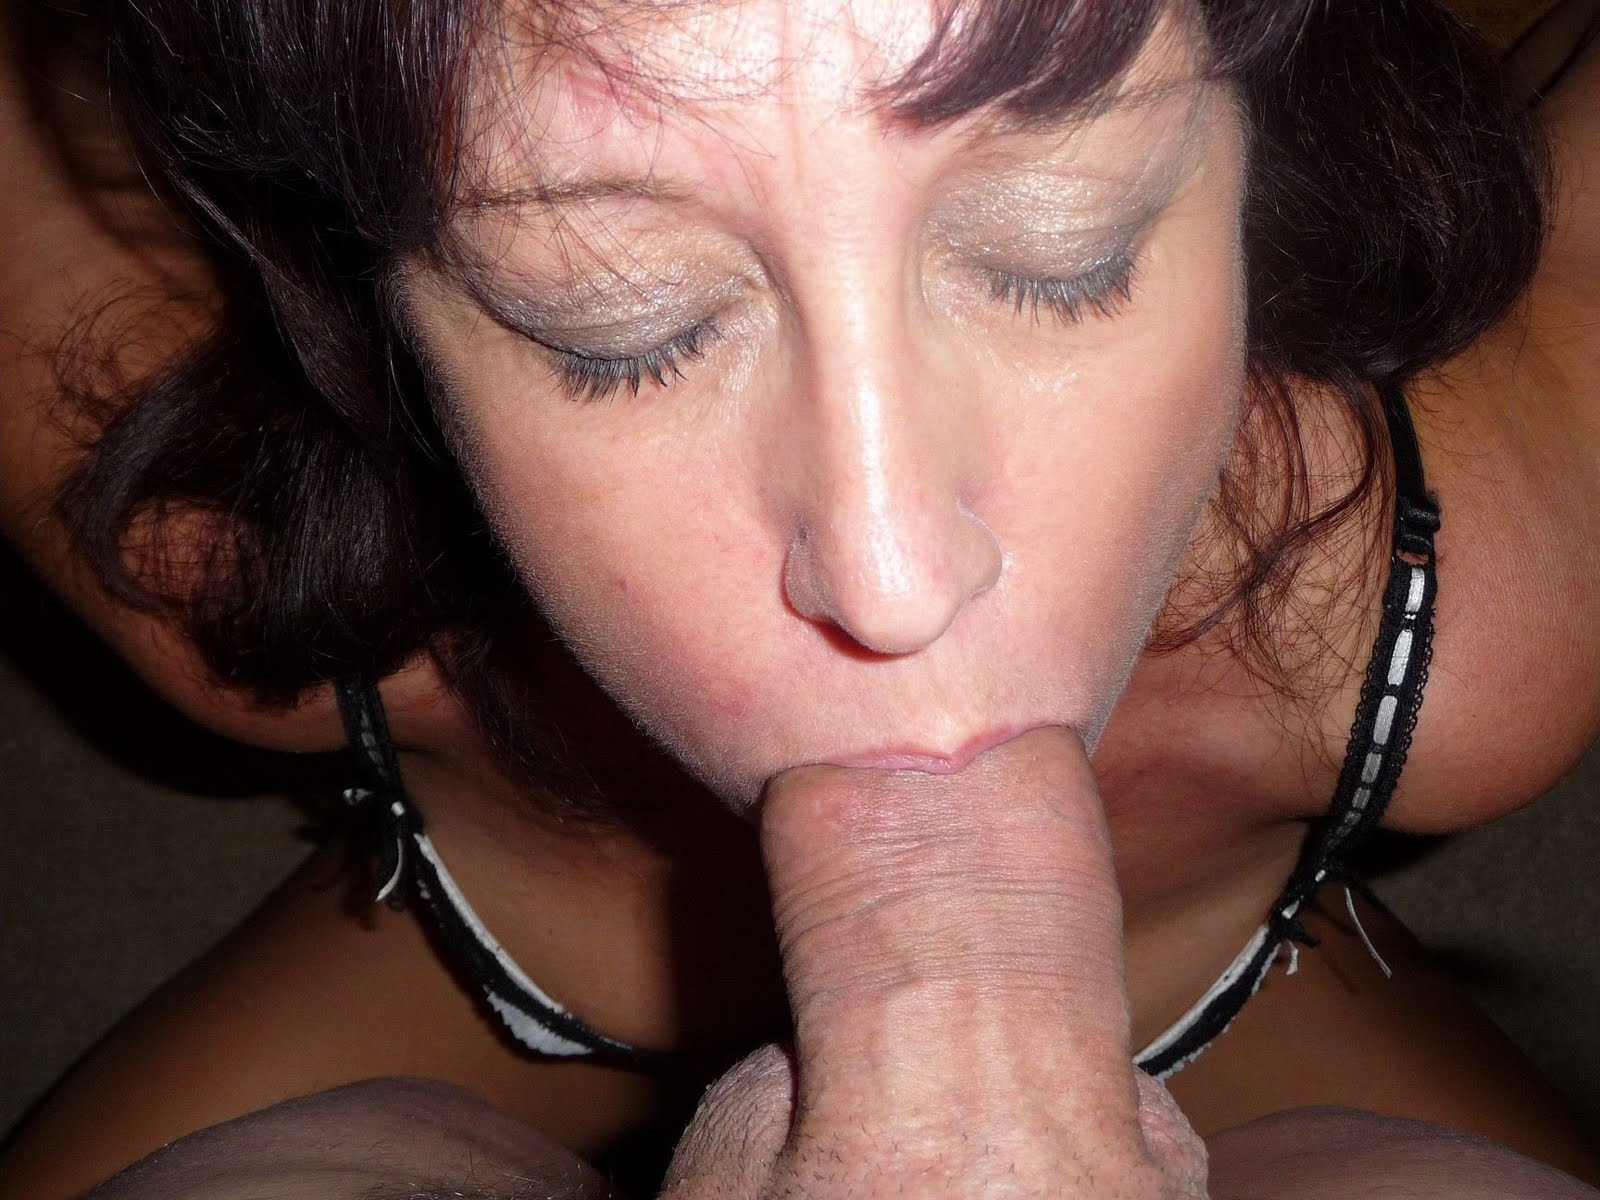 Amature granny deep throat